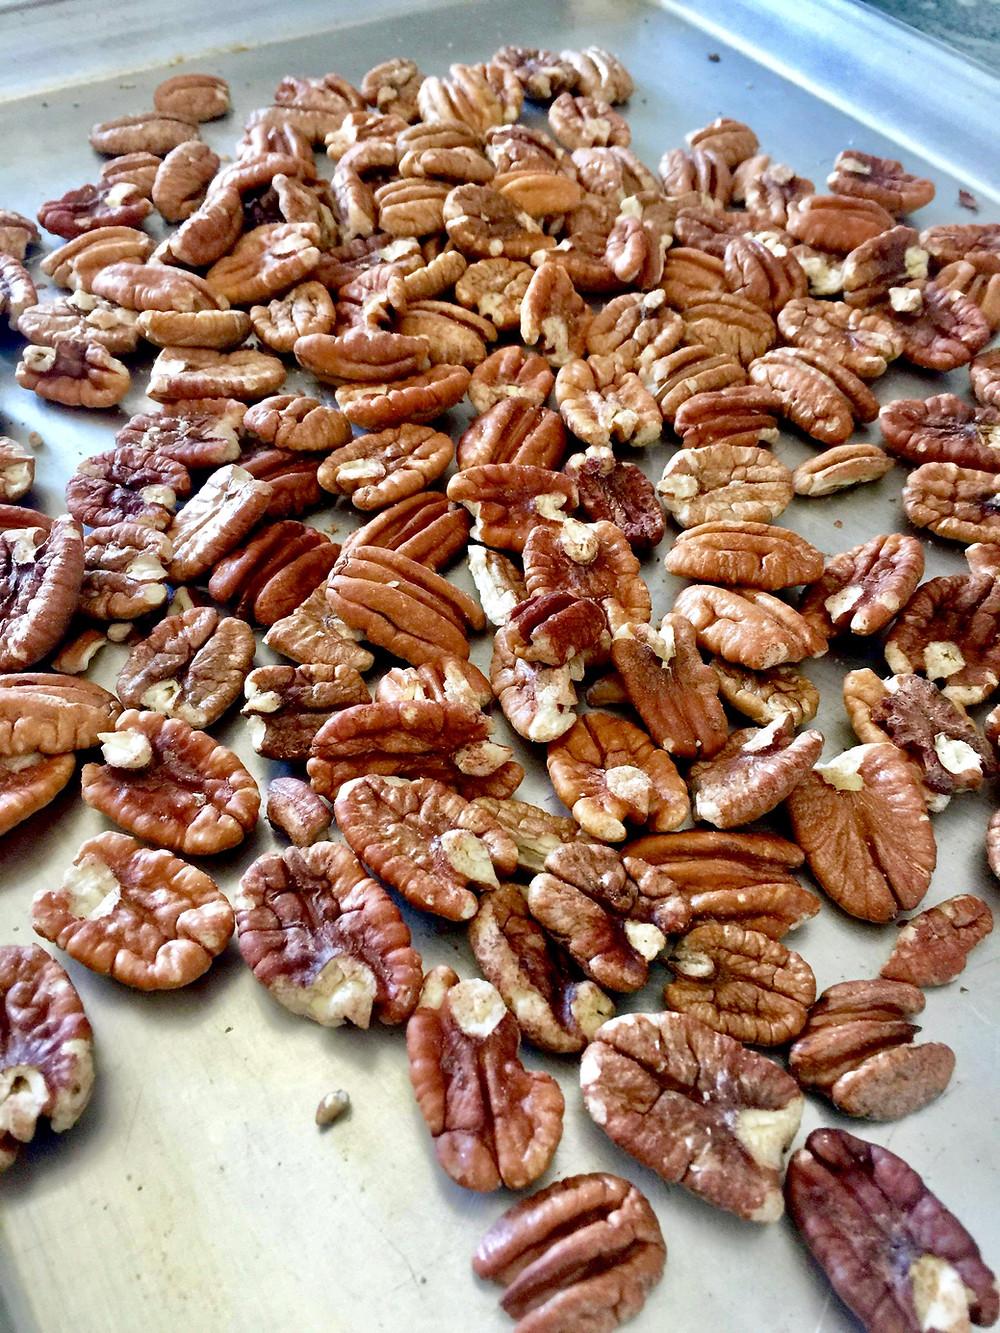 Pecans spread on a baking sheet, ready to roast